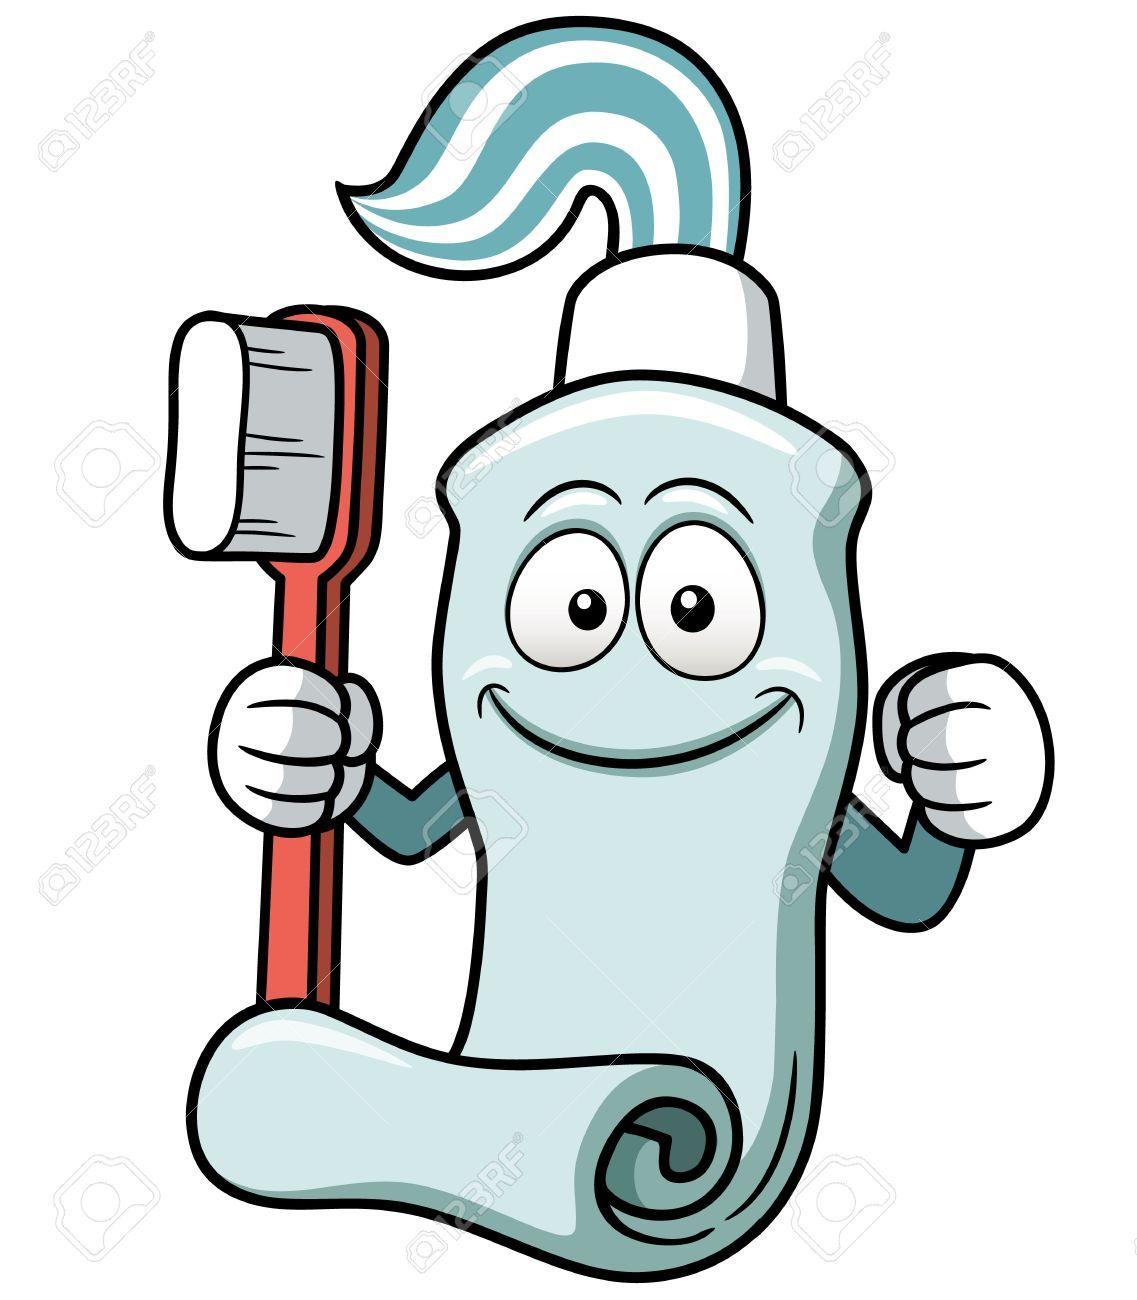 Vector Illustration Of Toothbrush And Toothpaste Cartoon Teeth Drawing Brushing Teeth Cartoon